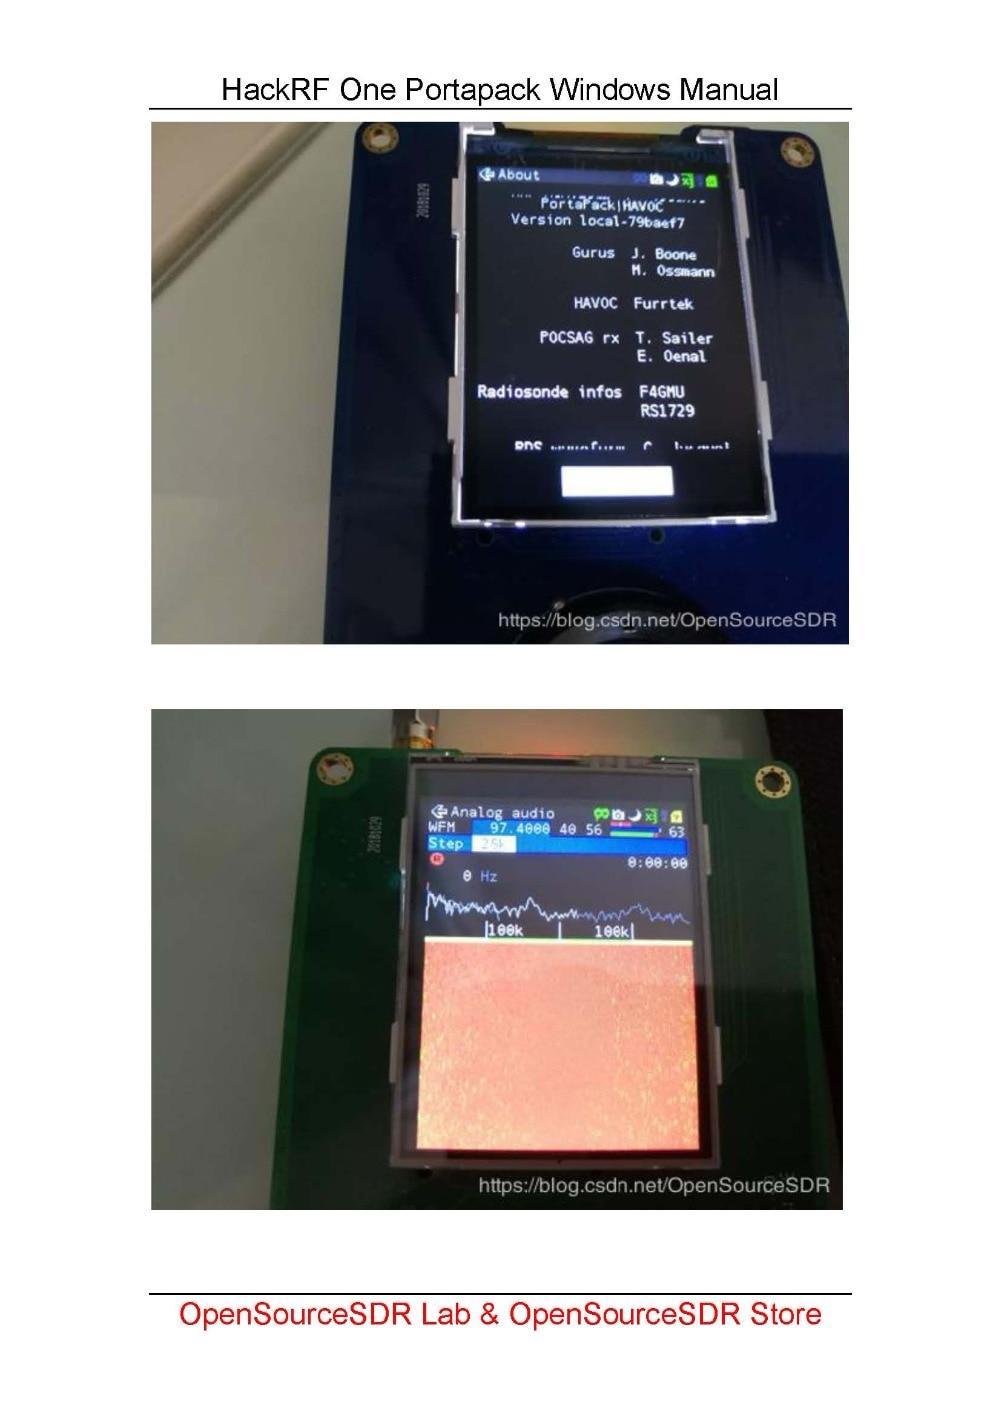 HackRF portapack windows_页面_05